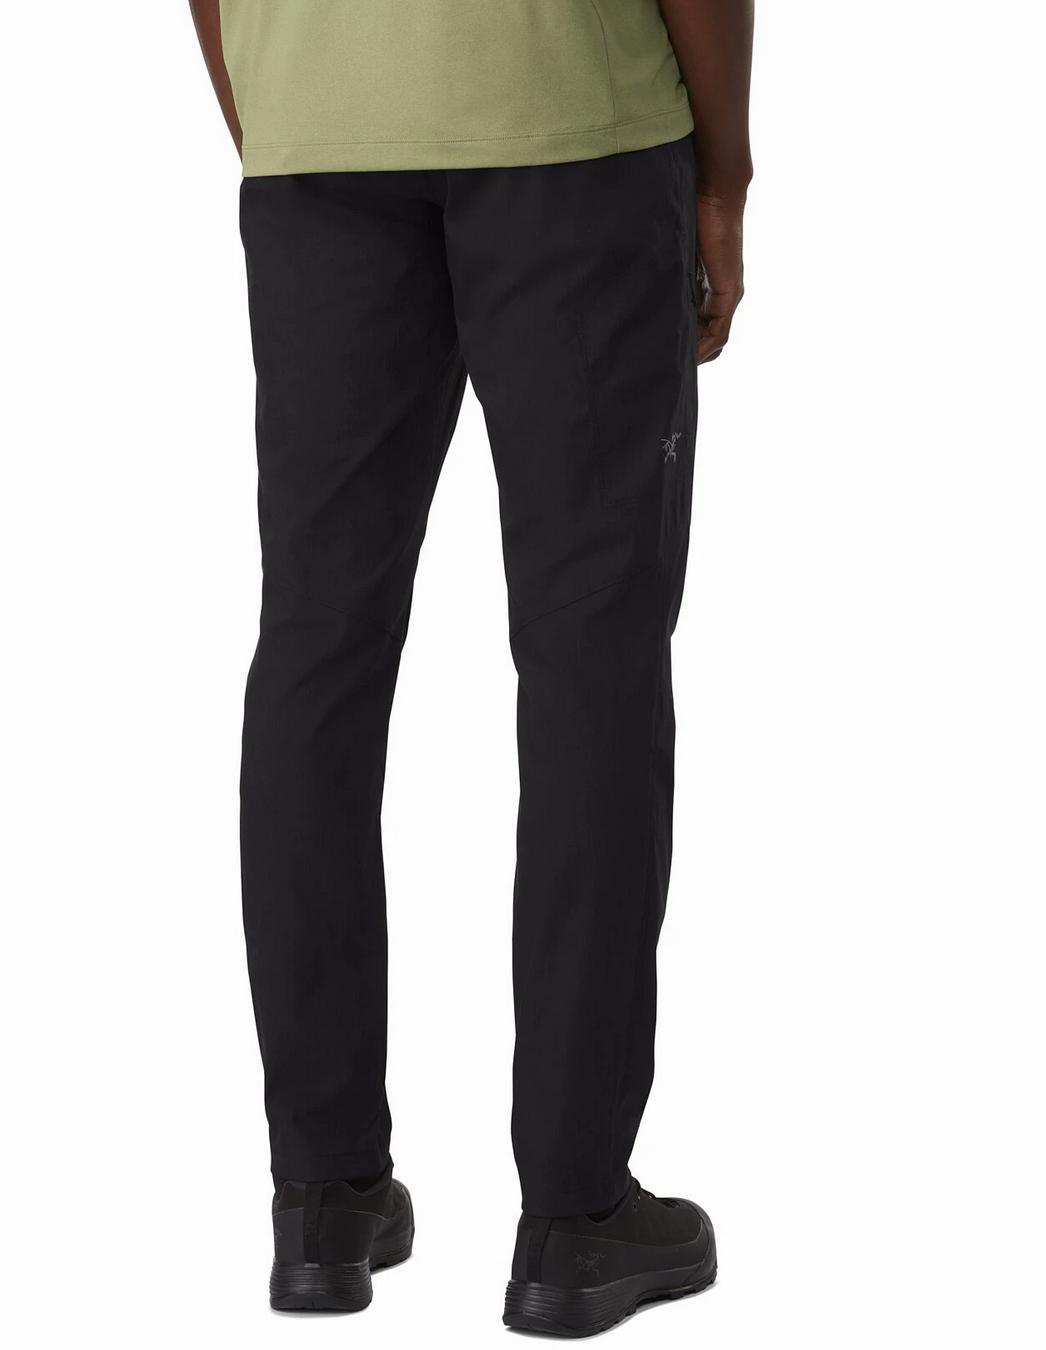 Men's Konseal Pant Black-2